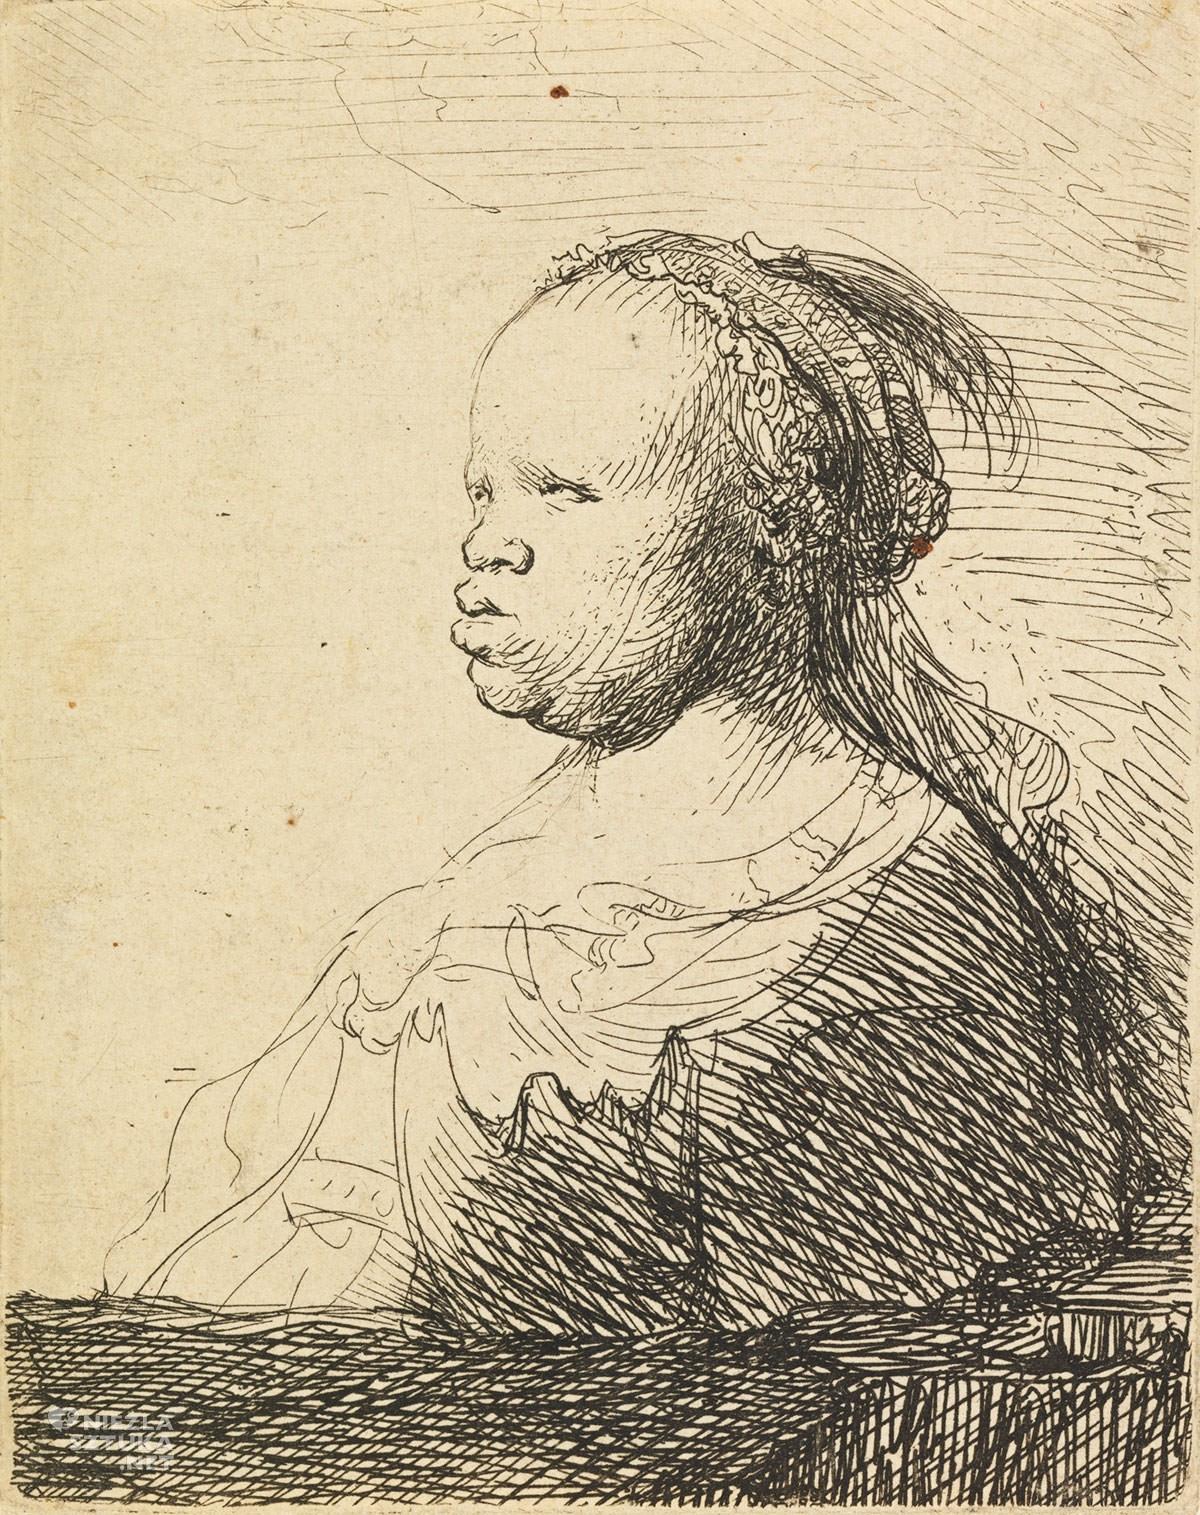 Rembrandt, Murzynka, grafika, malarstwo holenderskie, sztuka holenderska, Niezła sztuka